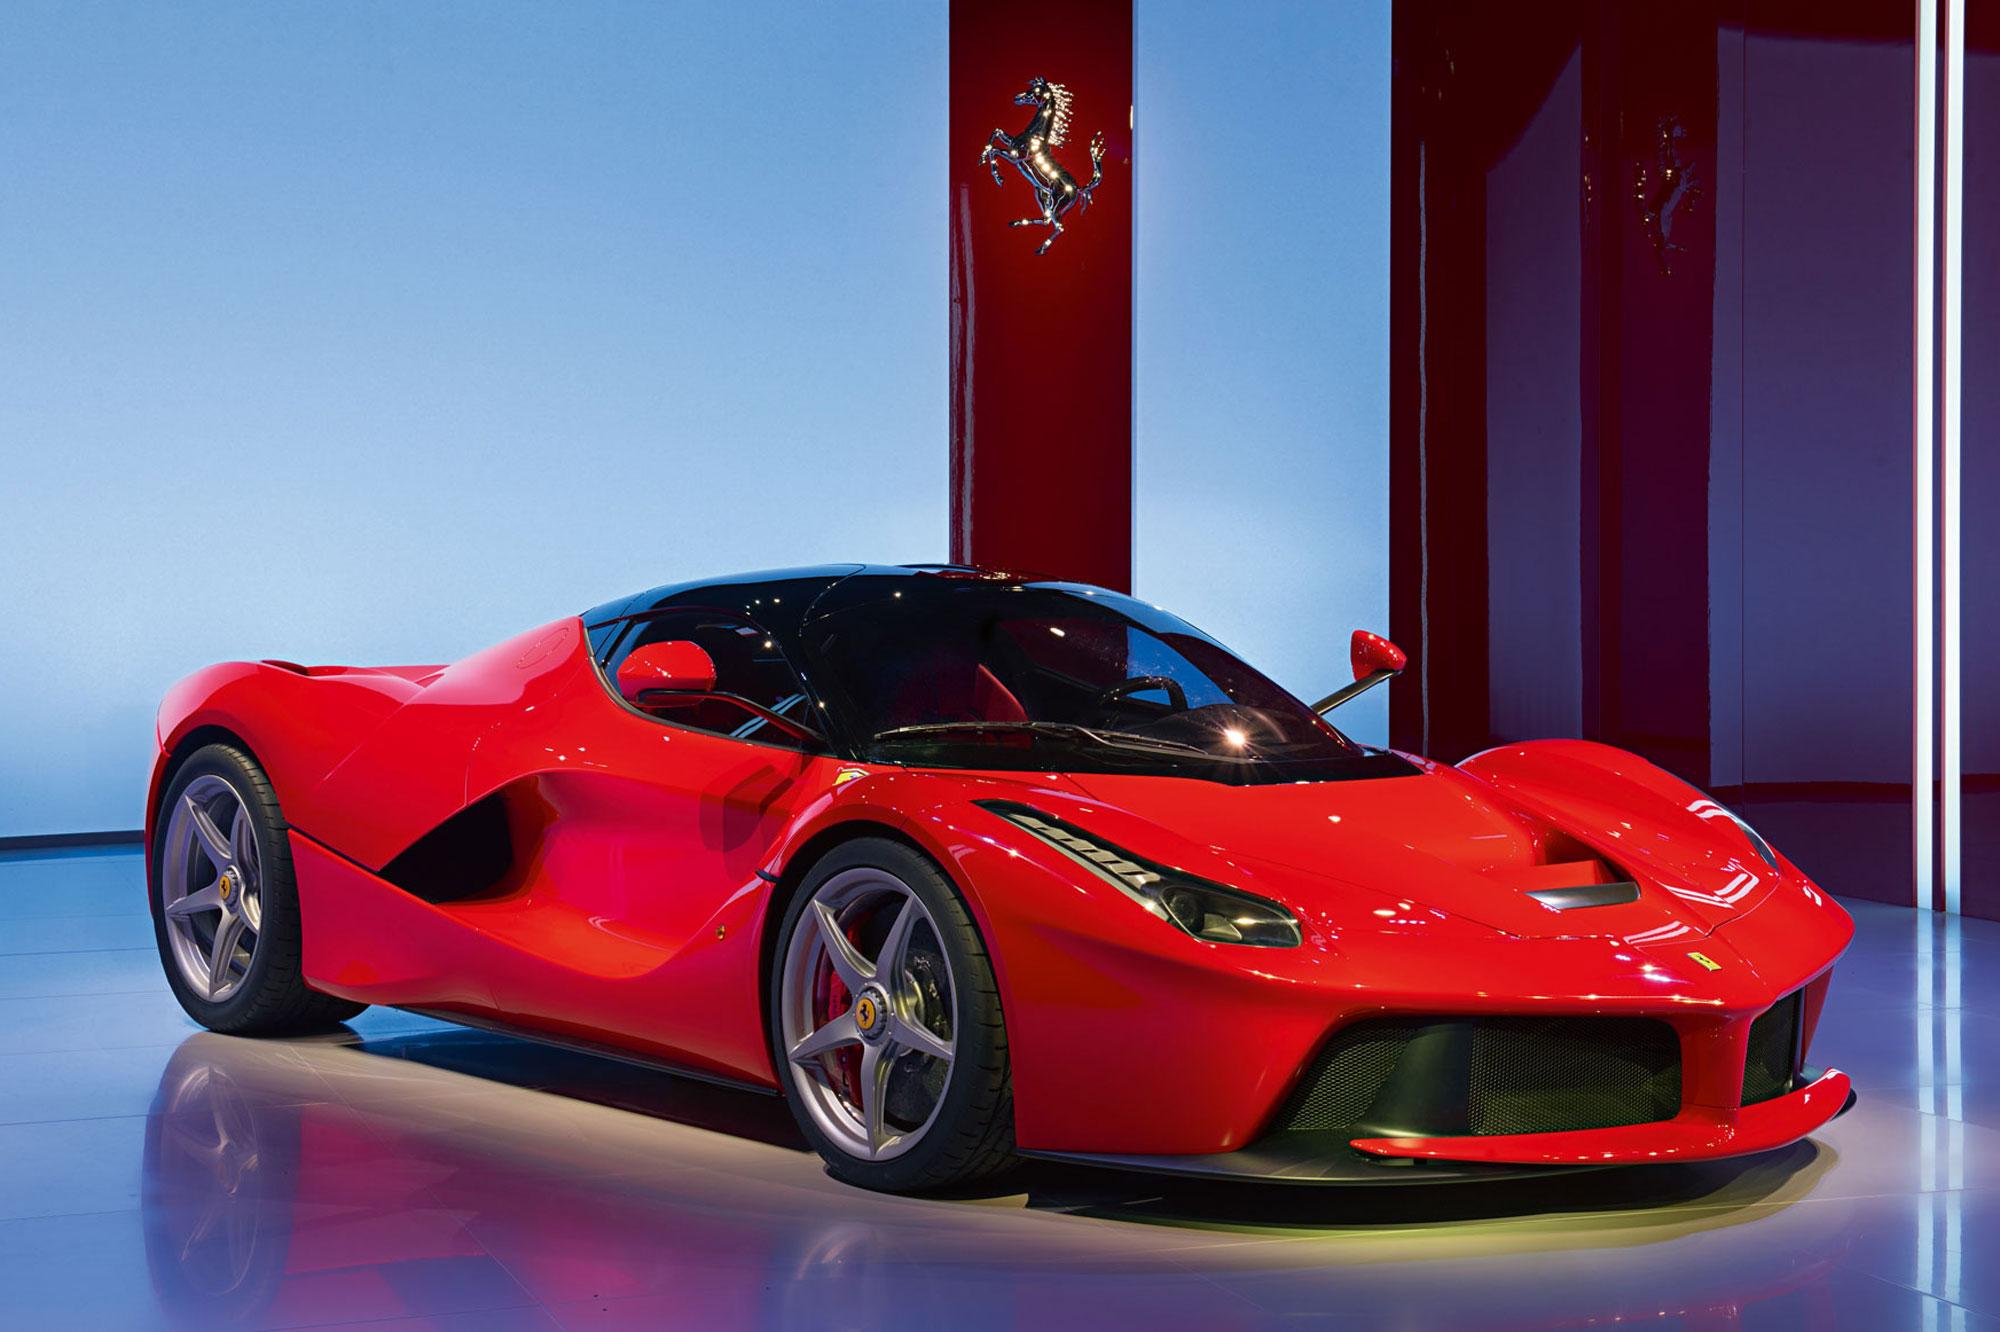 LaFerrari Marvelous Photo Ferrari Mondial 8 Quattrovalvole Rouge Occasion Cars Trend